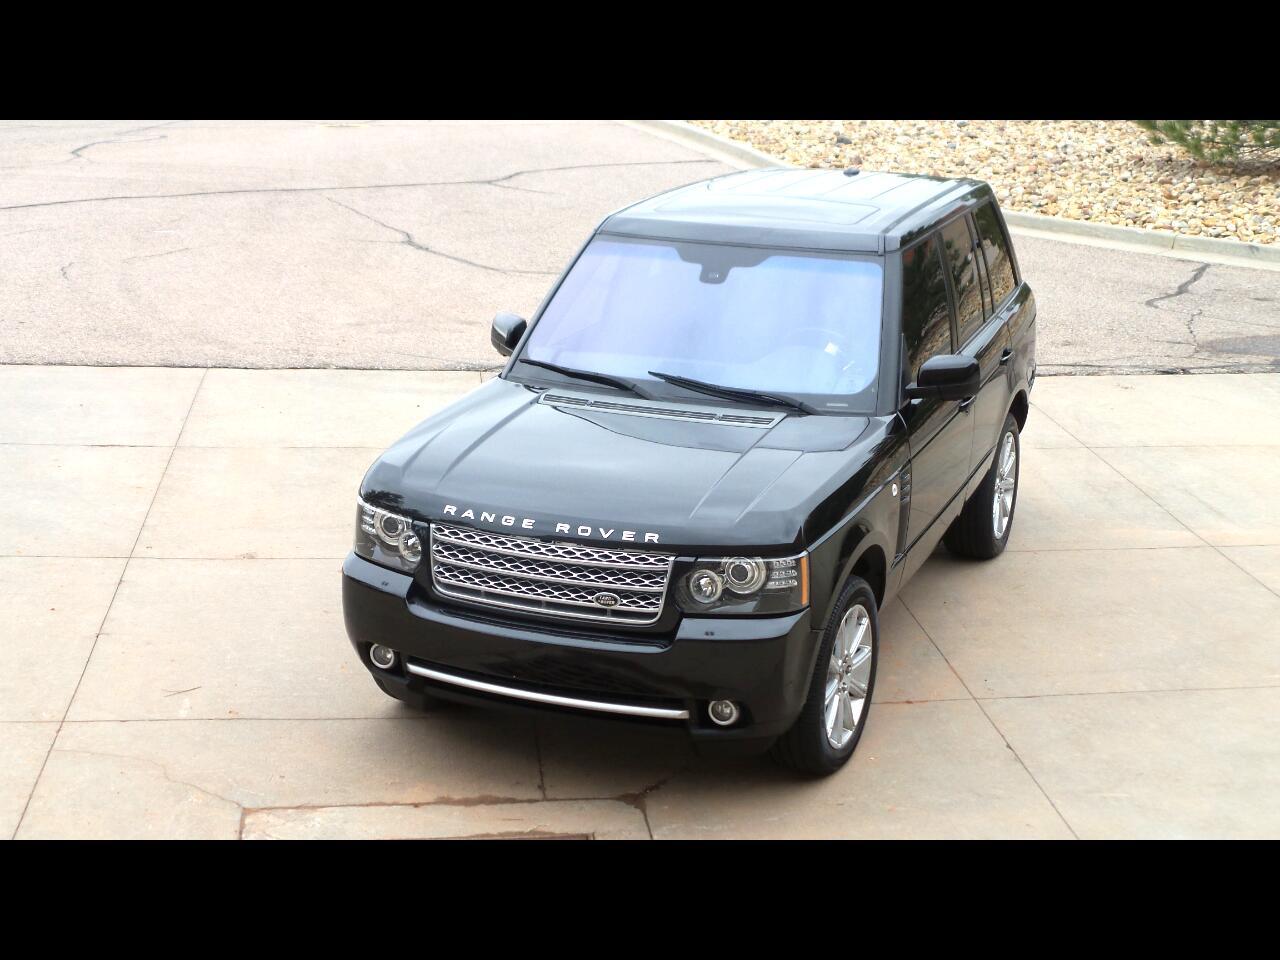 2012 Land Rover Range Rover V8 Supercharged SWB